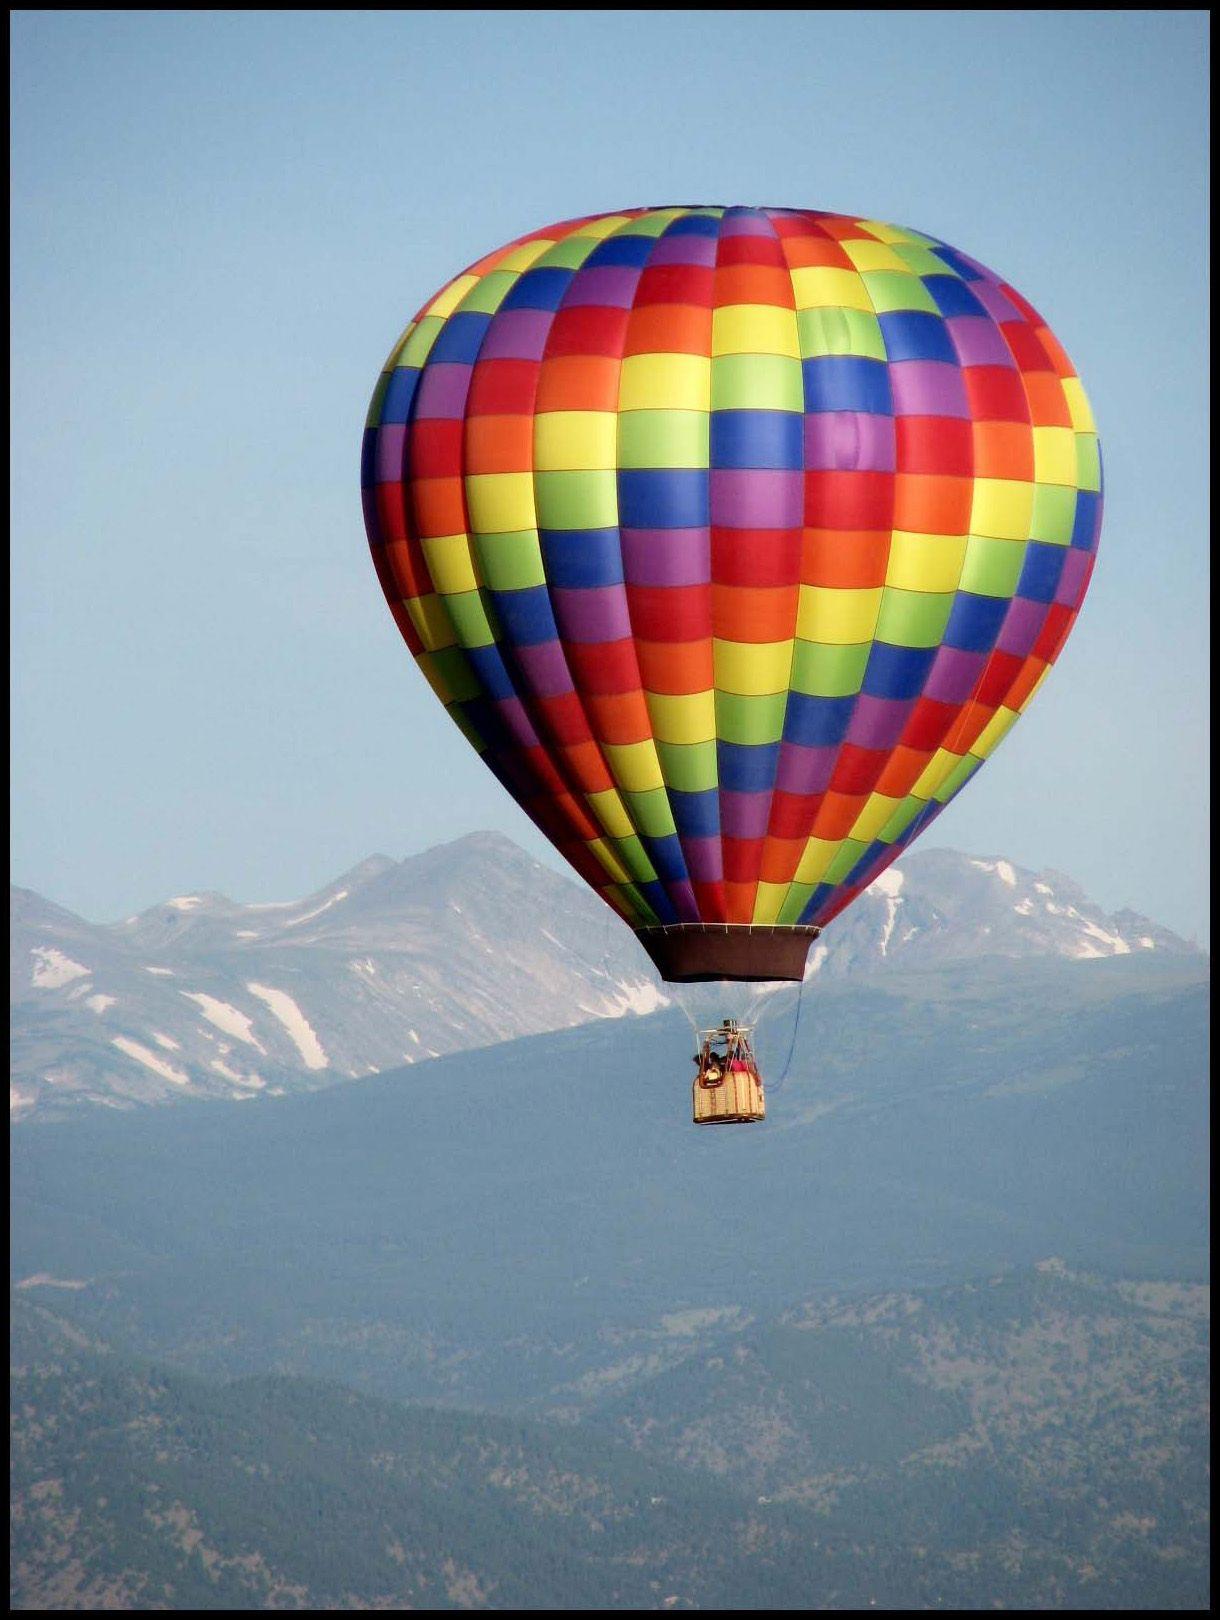 Flying A Hot-Air Balloon advise